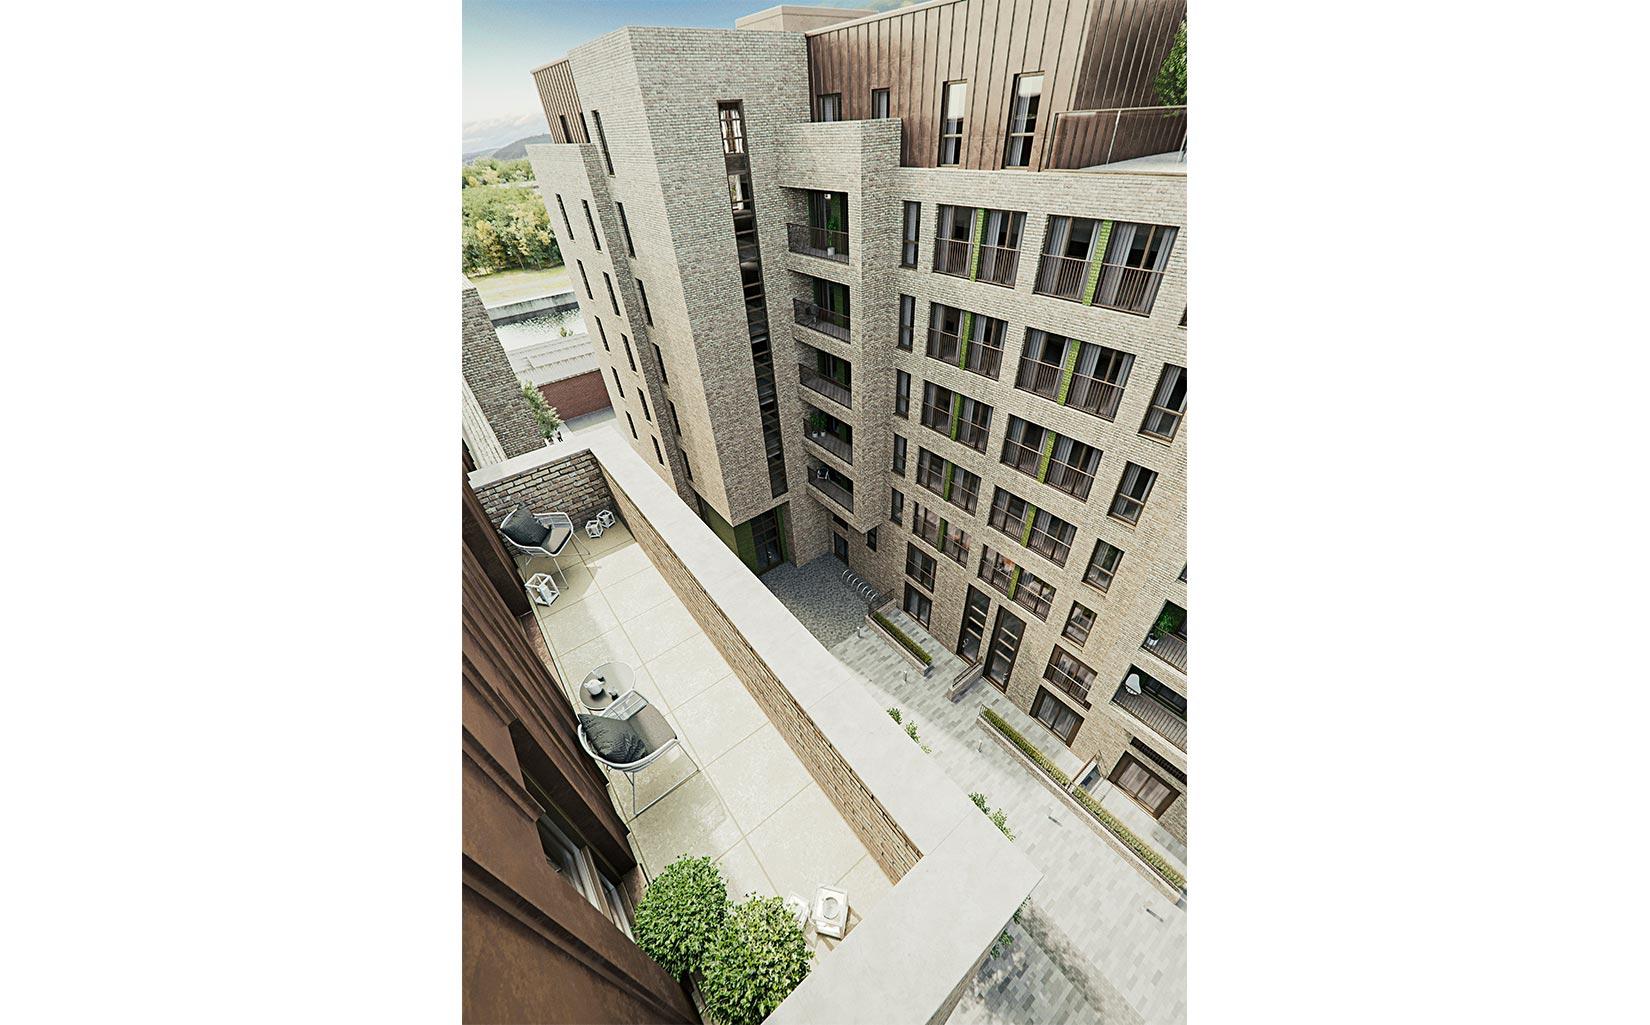 Dye Works, Worrall Street, Ordsall, Salford, 3D Aerial